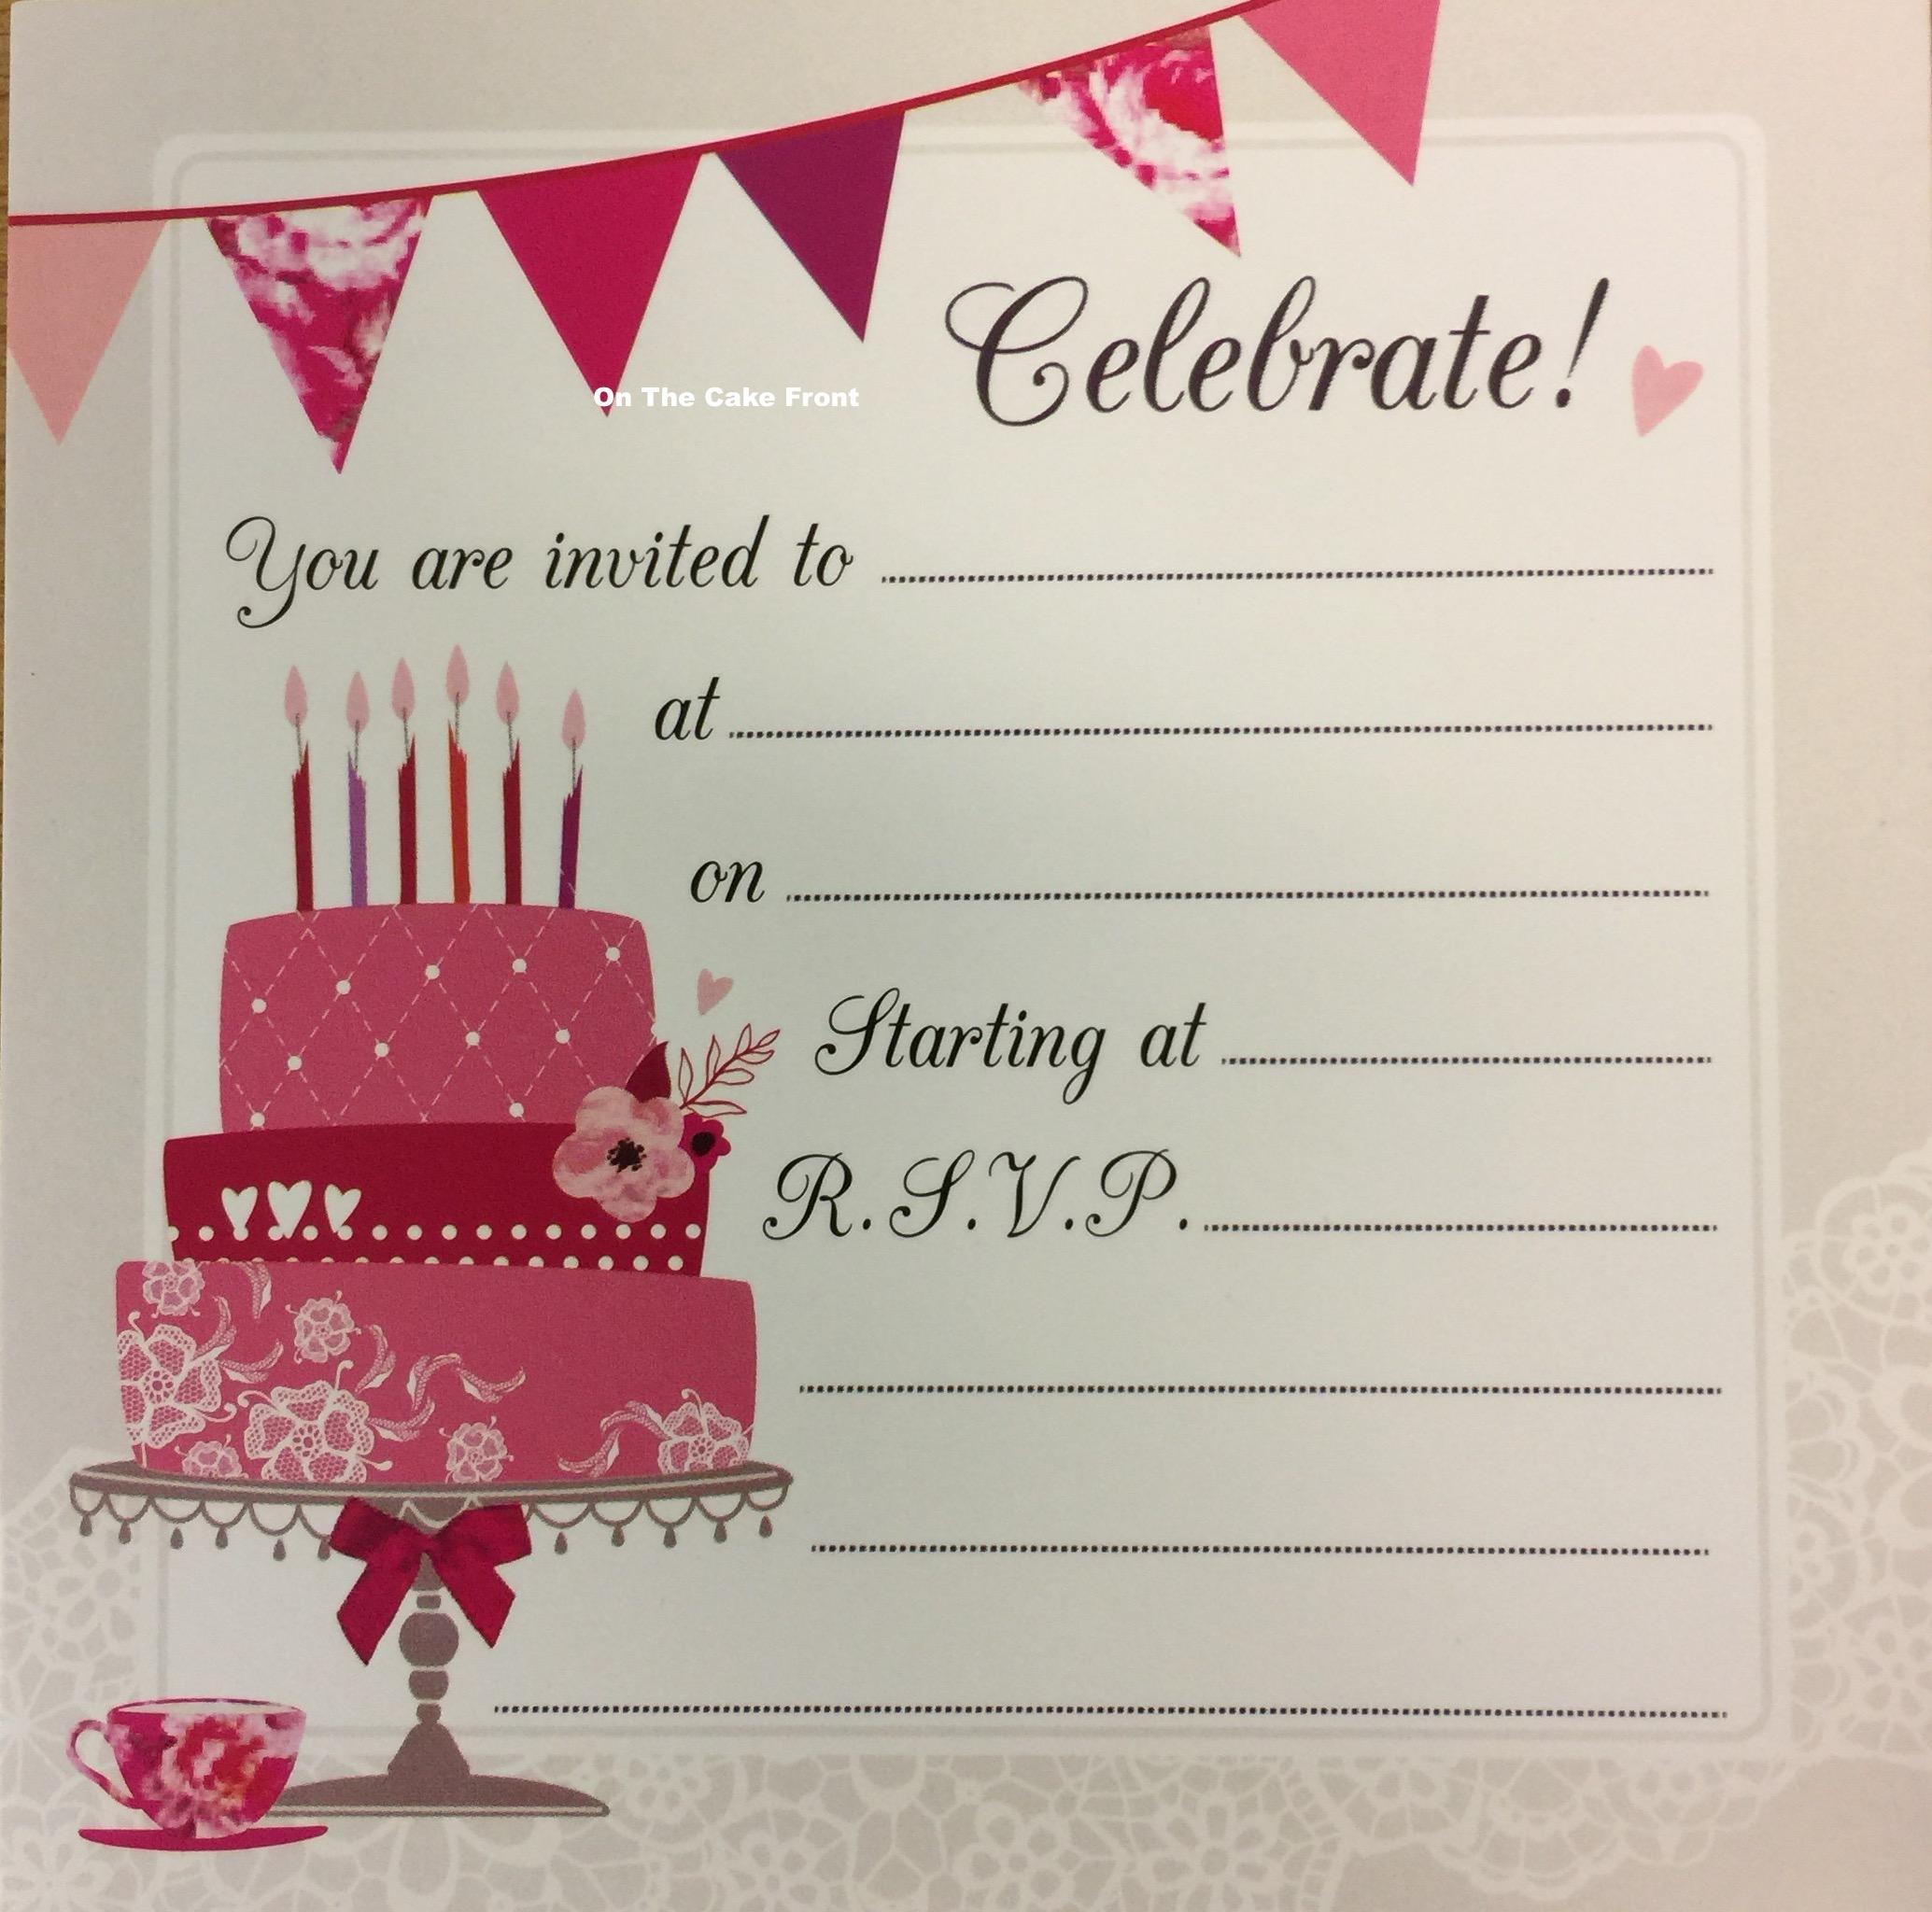 16 Celebrate vintage birthday cake party invitations & envelopes